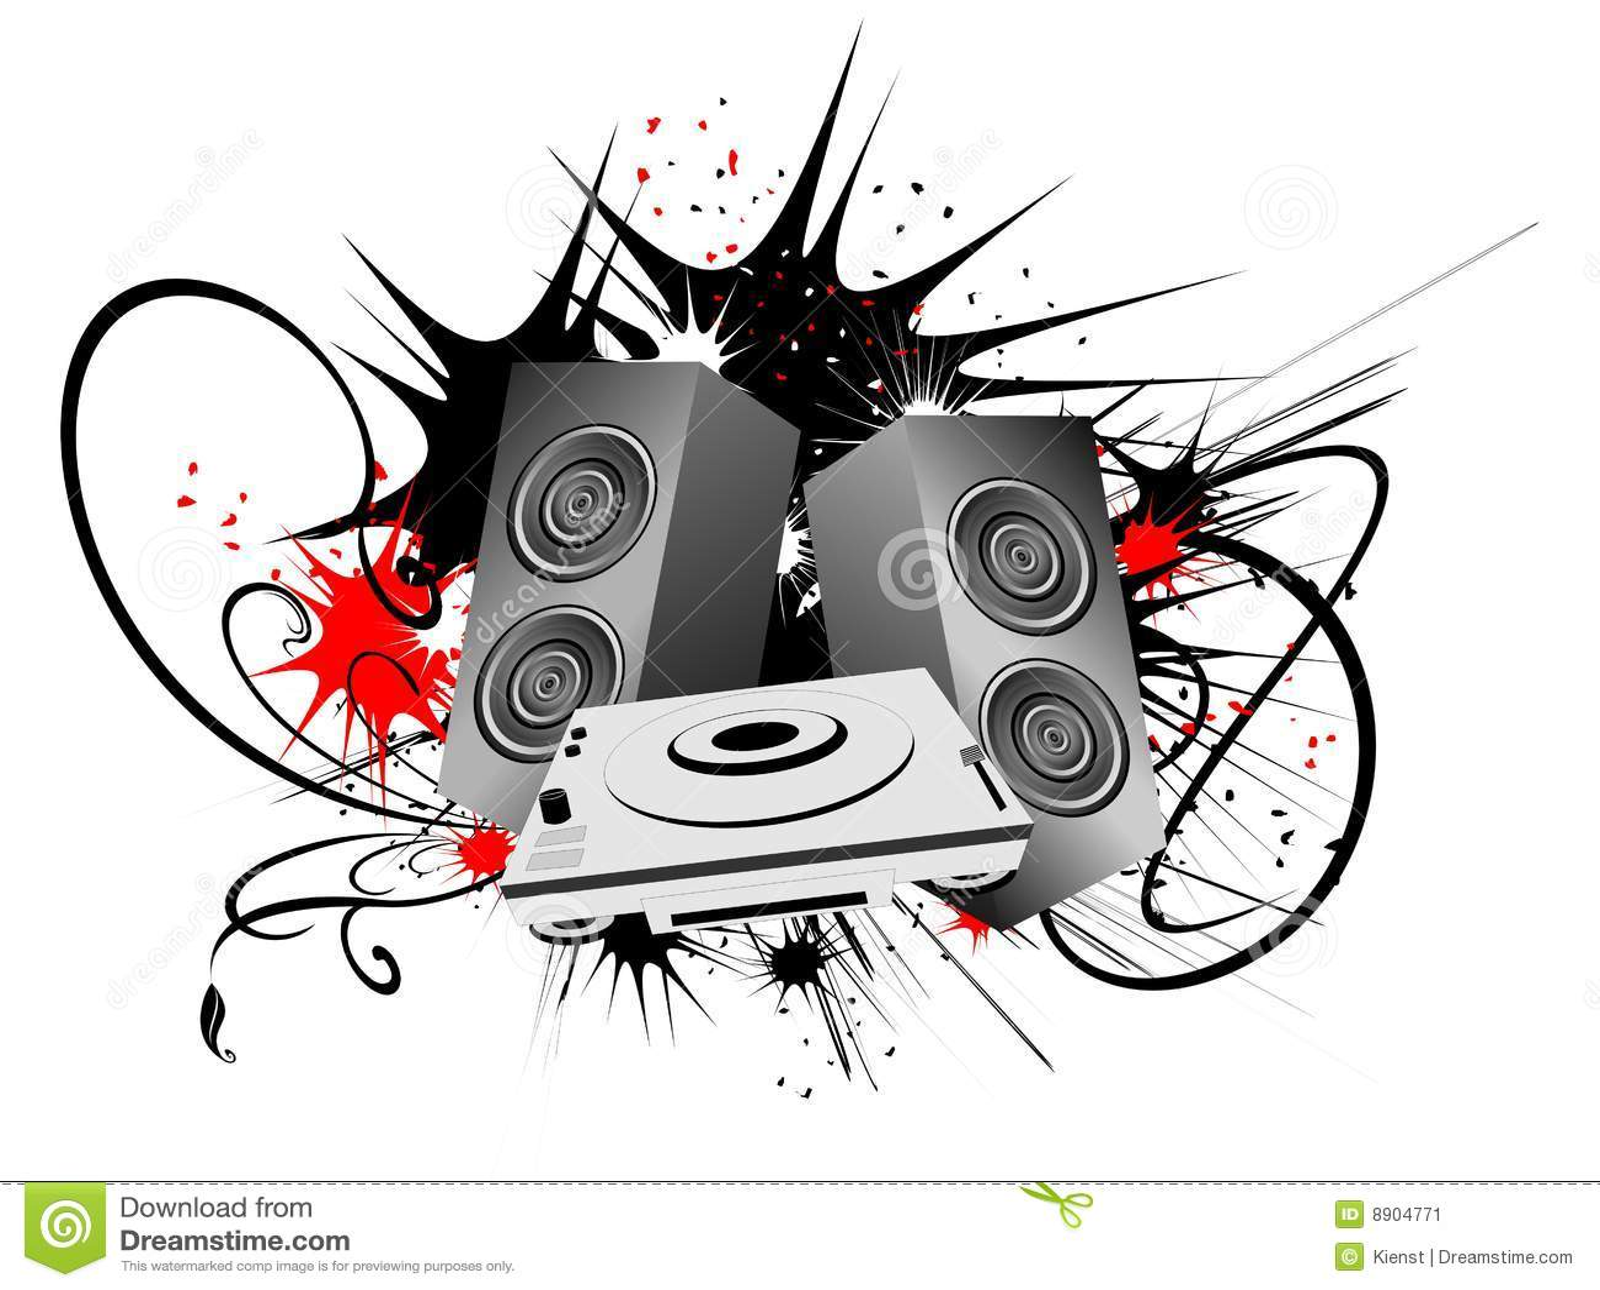 3d Vinyl Records Wallpaper Urban Art With Speaker Stock Vector Image Of Abstract